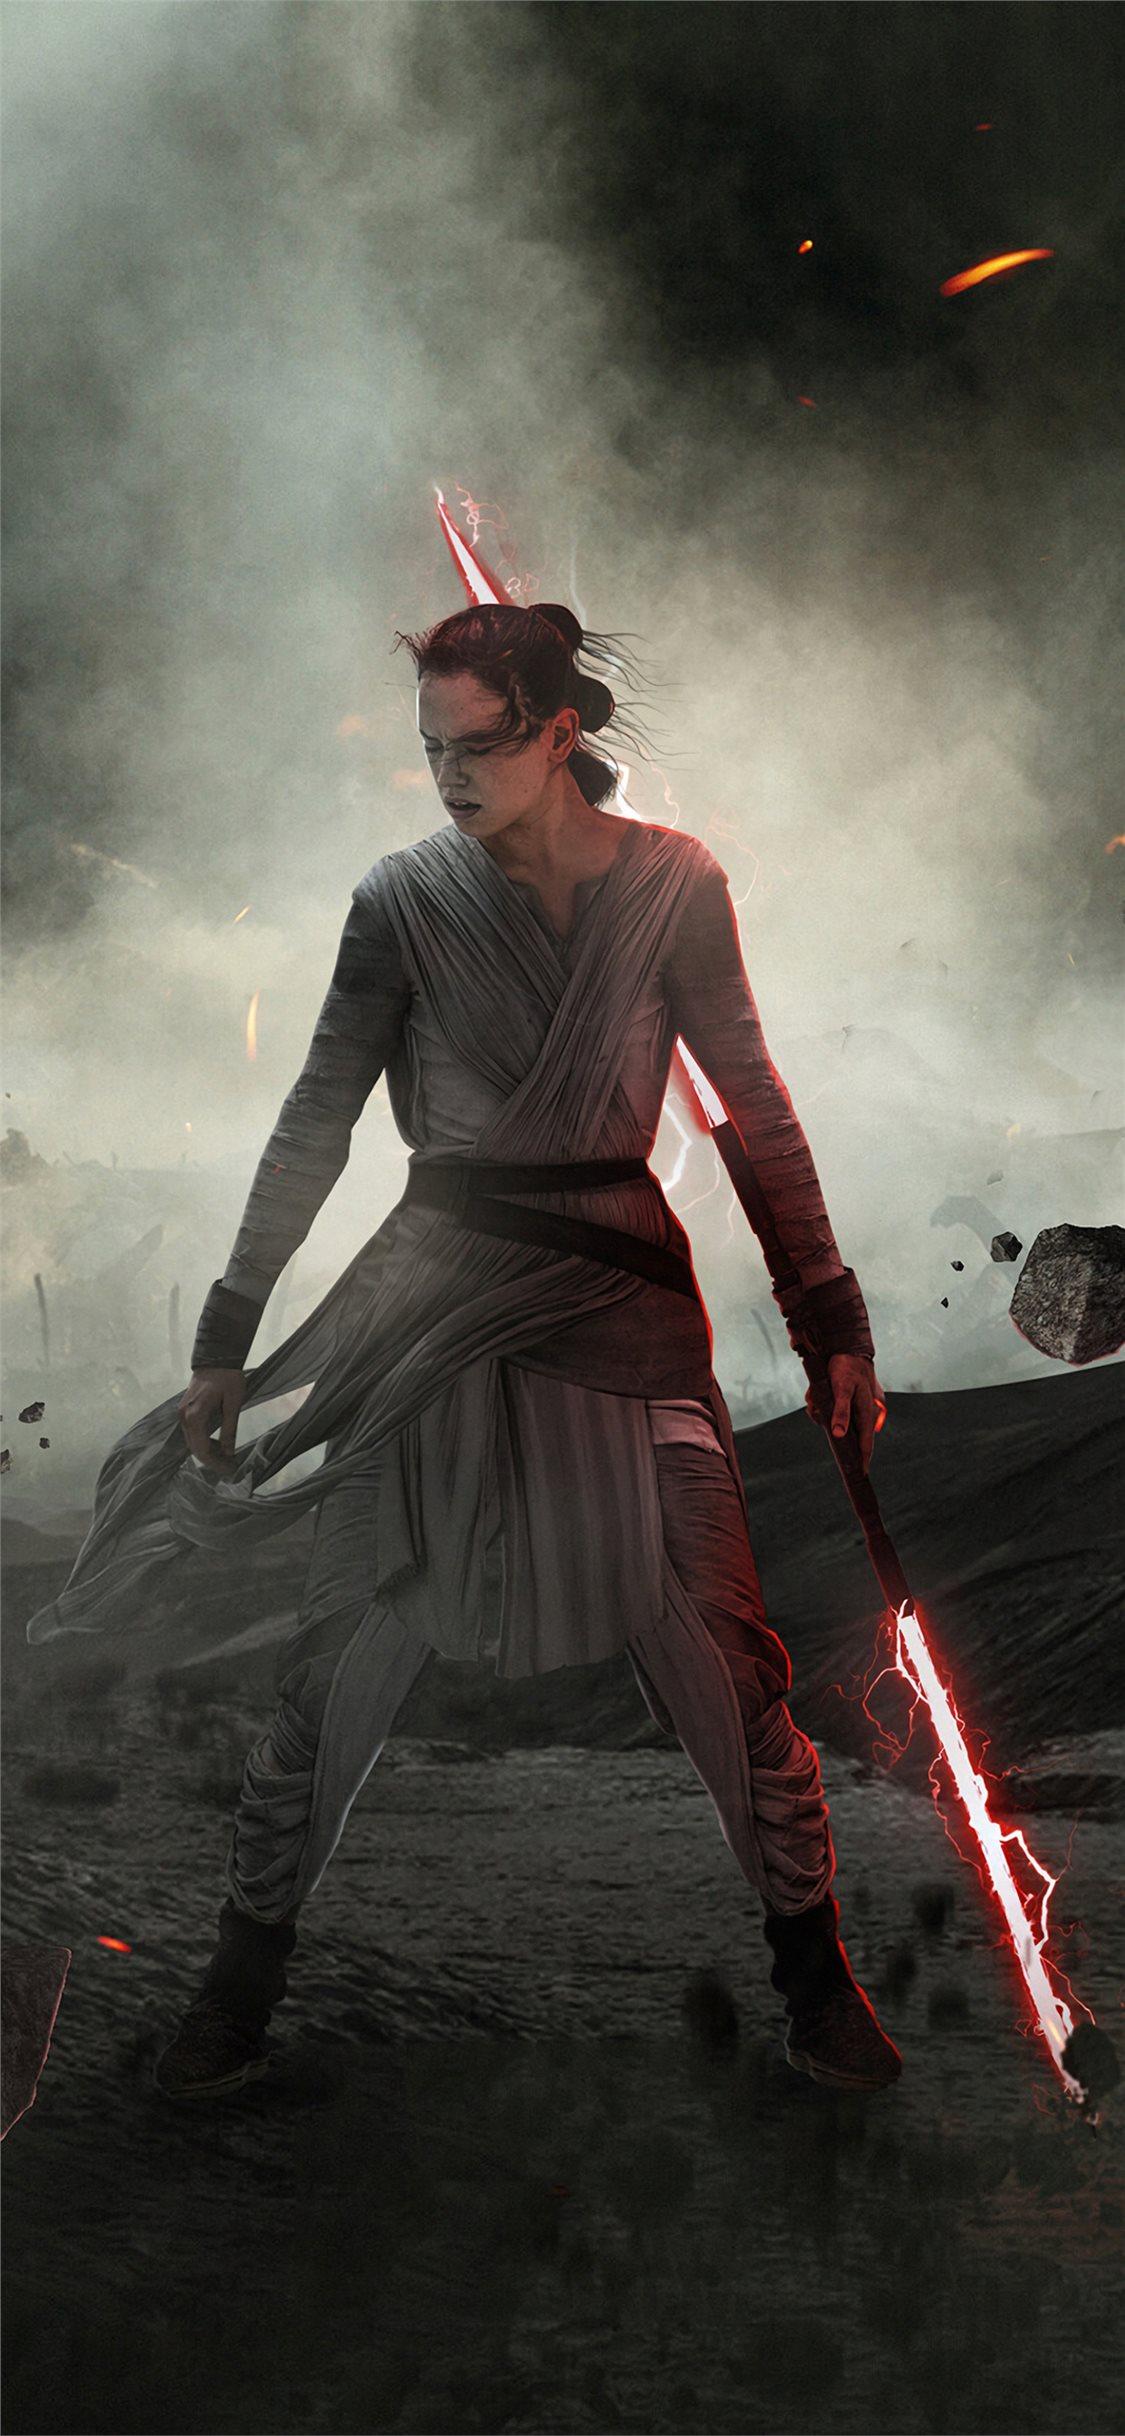 Dark Rey Star Wars The Rise Of Skywalker Iphone X Wallpapers Free